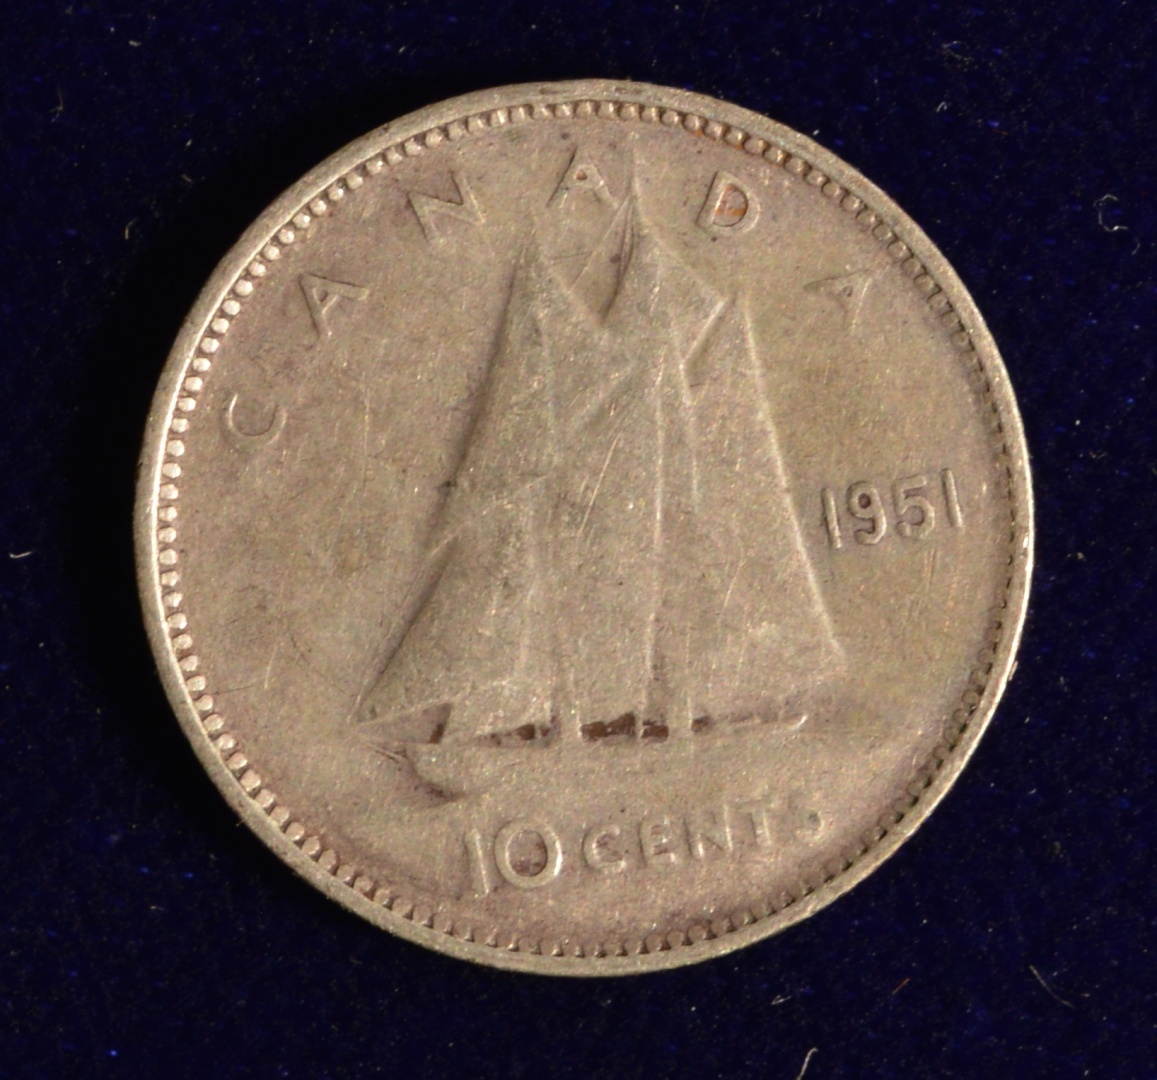 Canada 1945 10 CENT Nice Coin Book filler ~ average circulated